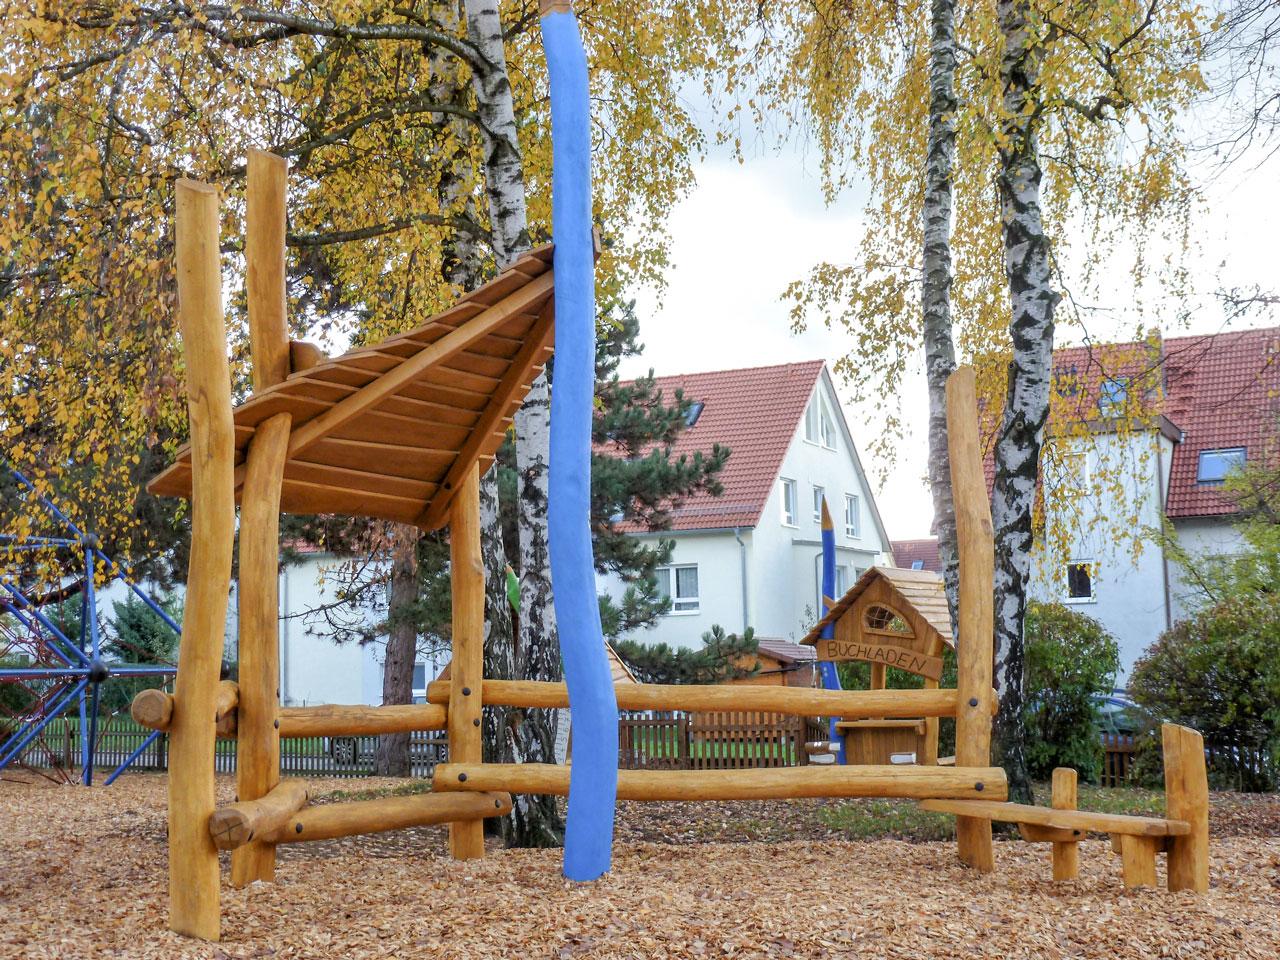 E 16 Pavillon Sitzecke Fellbach